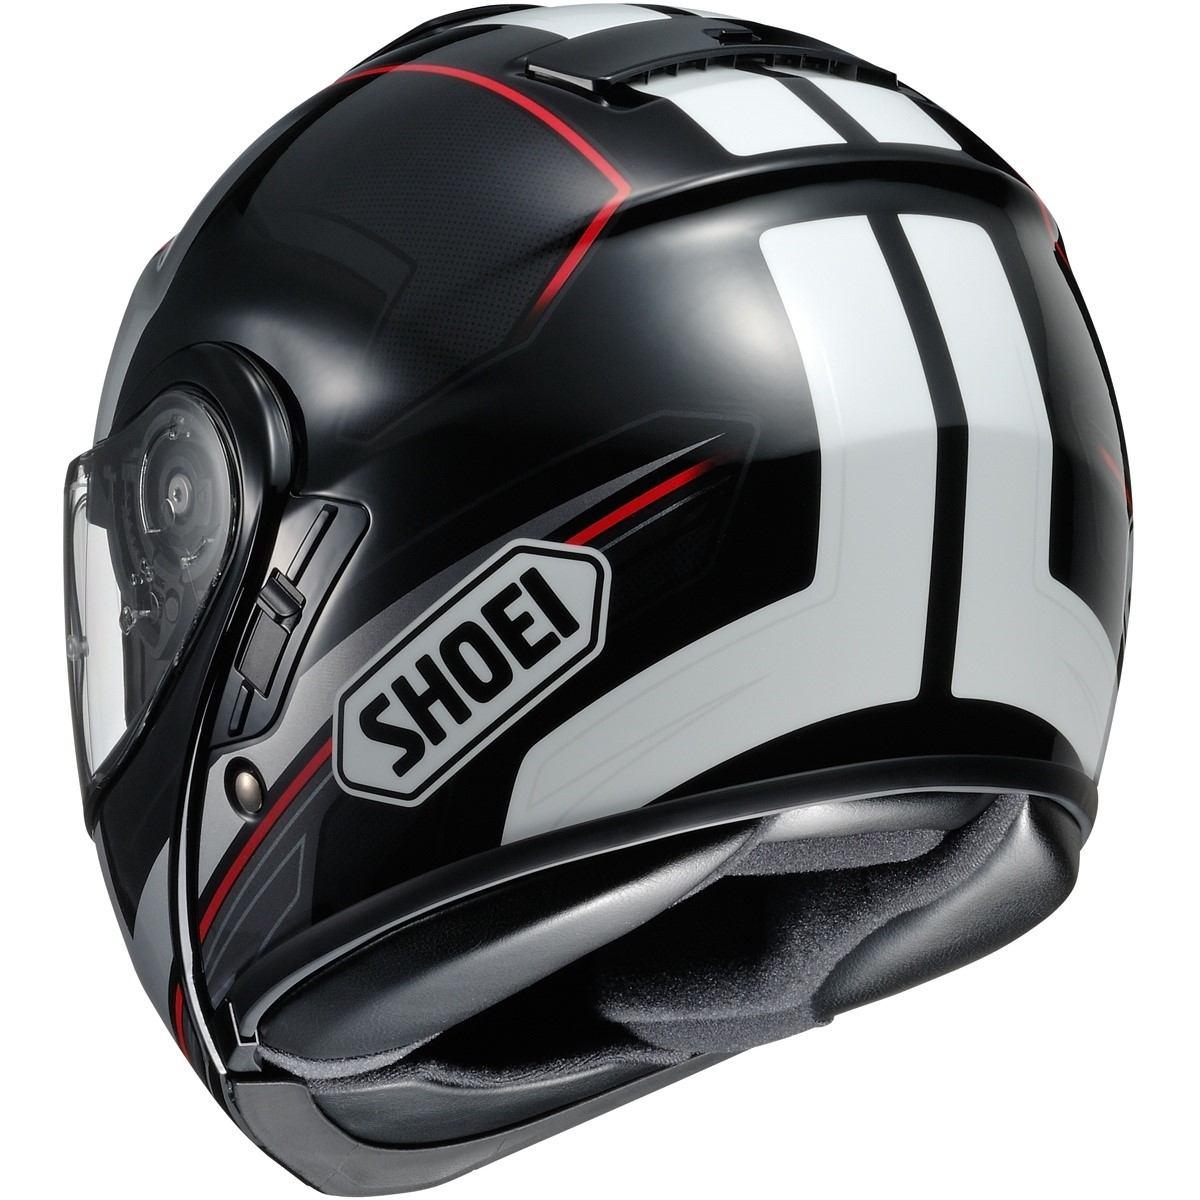 Capacete Shoei Neotec Imminent TC-5 Escamoteável - SUPEROFERTA!   - Nova Centro Boutique Roupas para Motociclistas